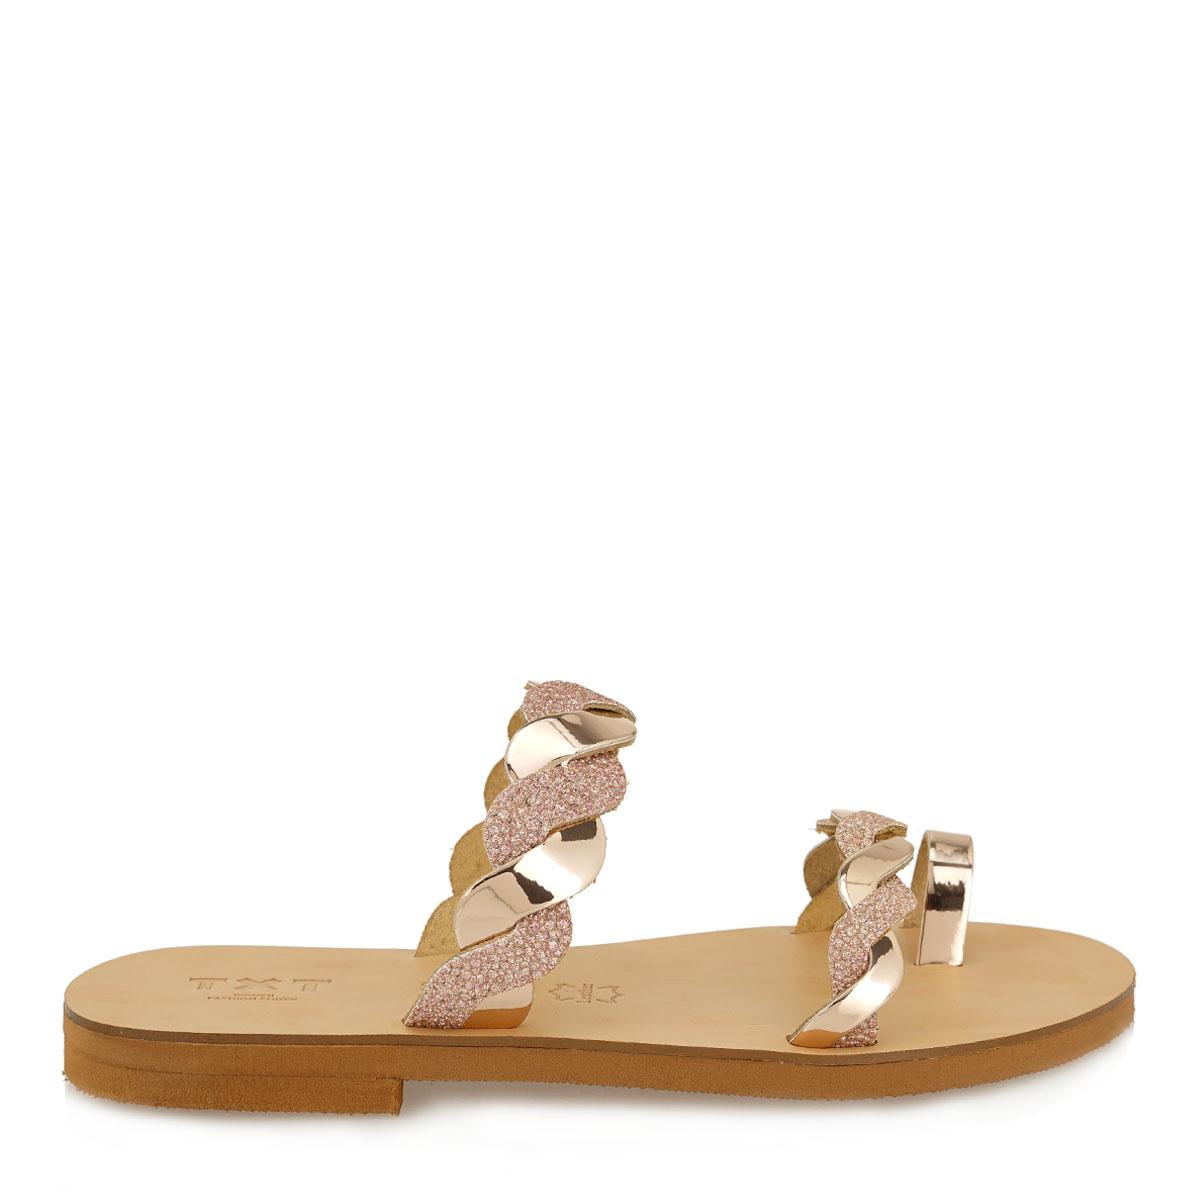 7f701be329f FLATS σχέδιο: I484F0221 - Roe Shoes Collection